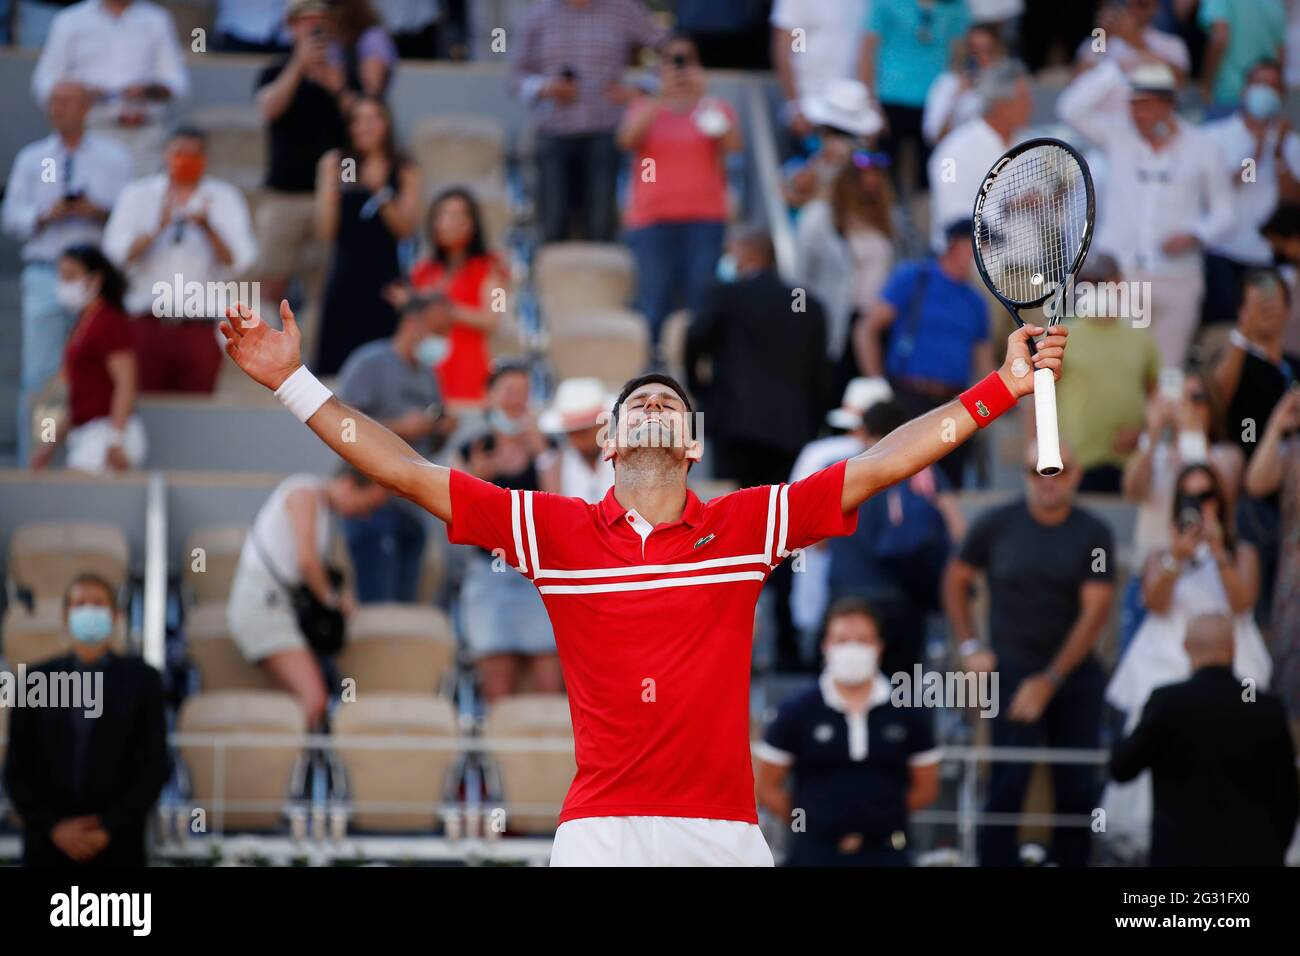 Tennis - French Open - Roland Garros, Paris, France - June 13, 2021 Serbia's Novak Djokovic celebrates winning the final against Greece's Stefanos Tsitsipas REUTERS/Gonzalo Fuentes Stock Photo